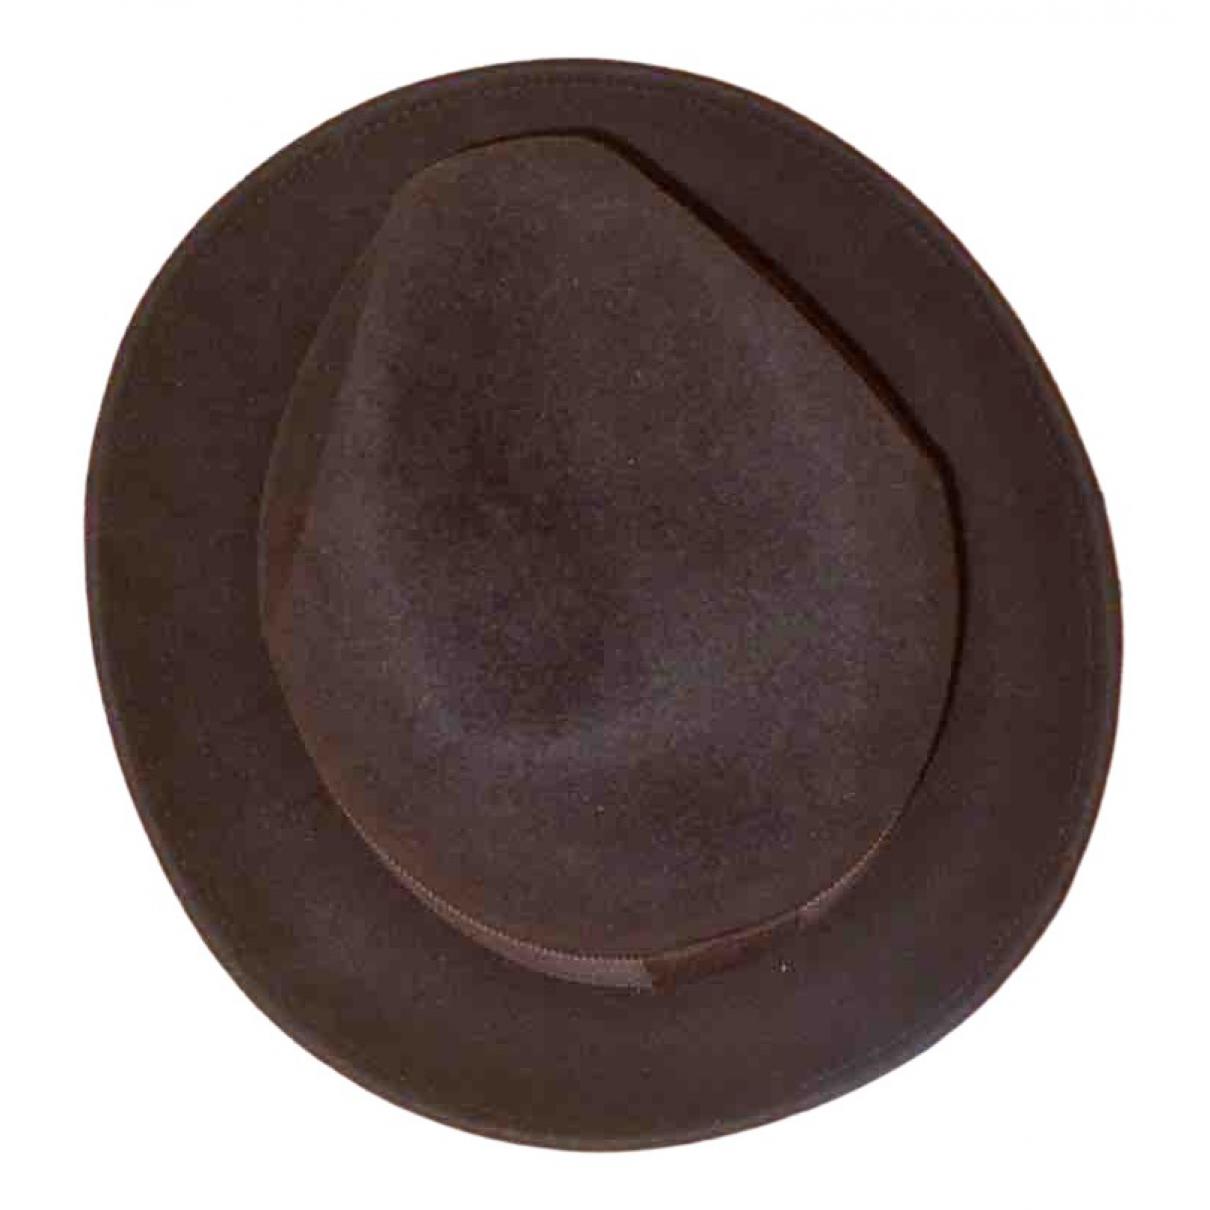 Maison Michel \N Brown Wool hat for Women S International